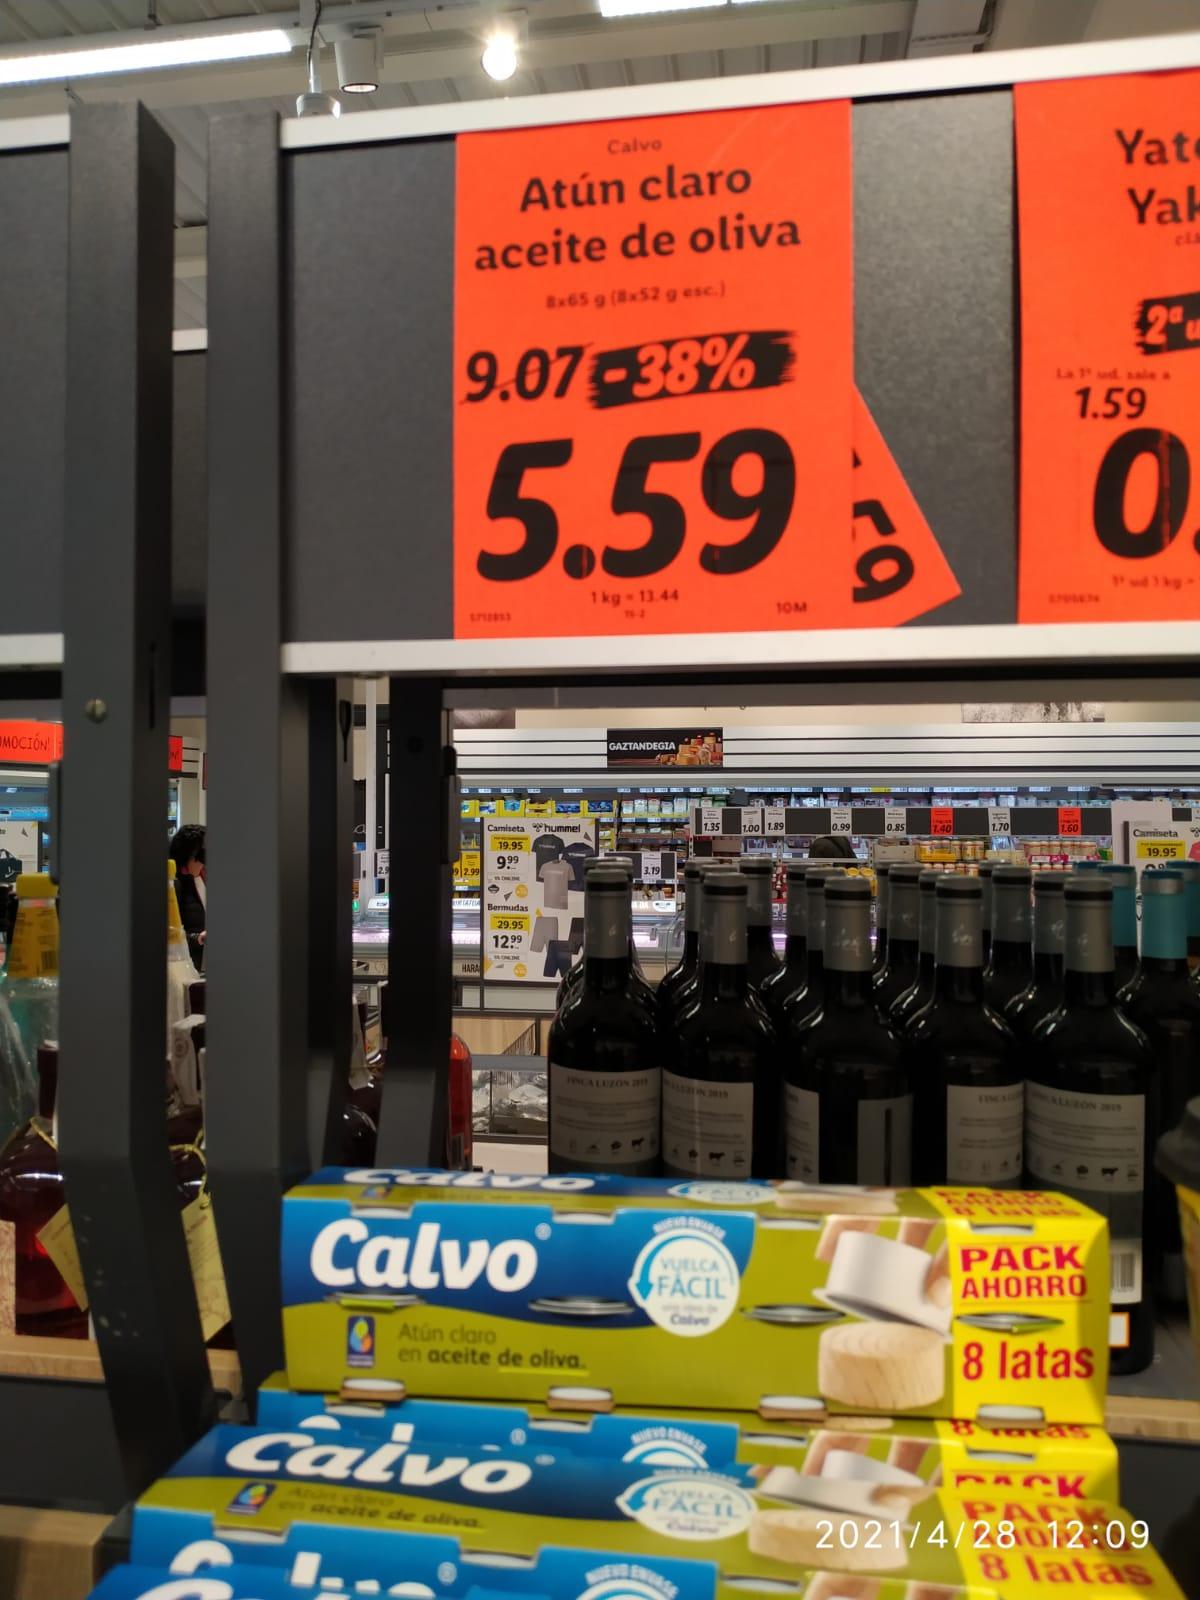 Atún claro Calvo en aceite de oliva Pack de 8. Lidl